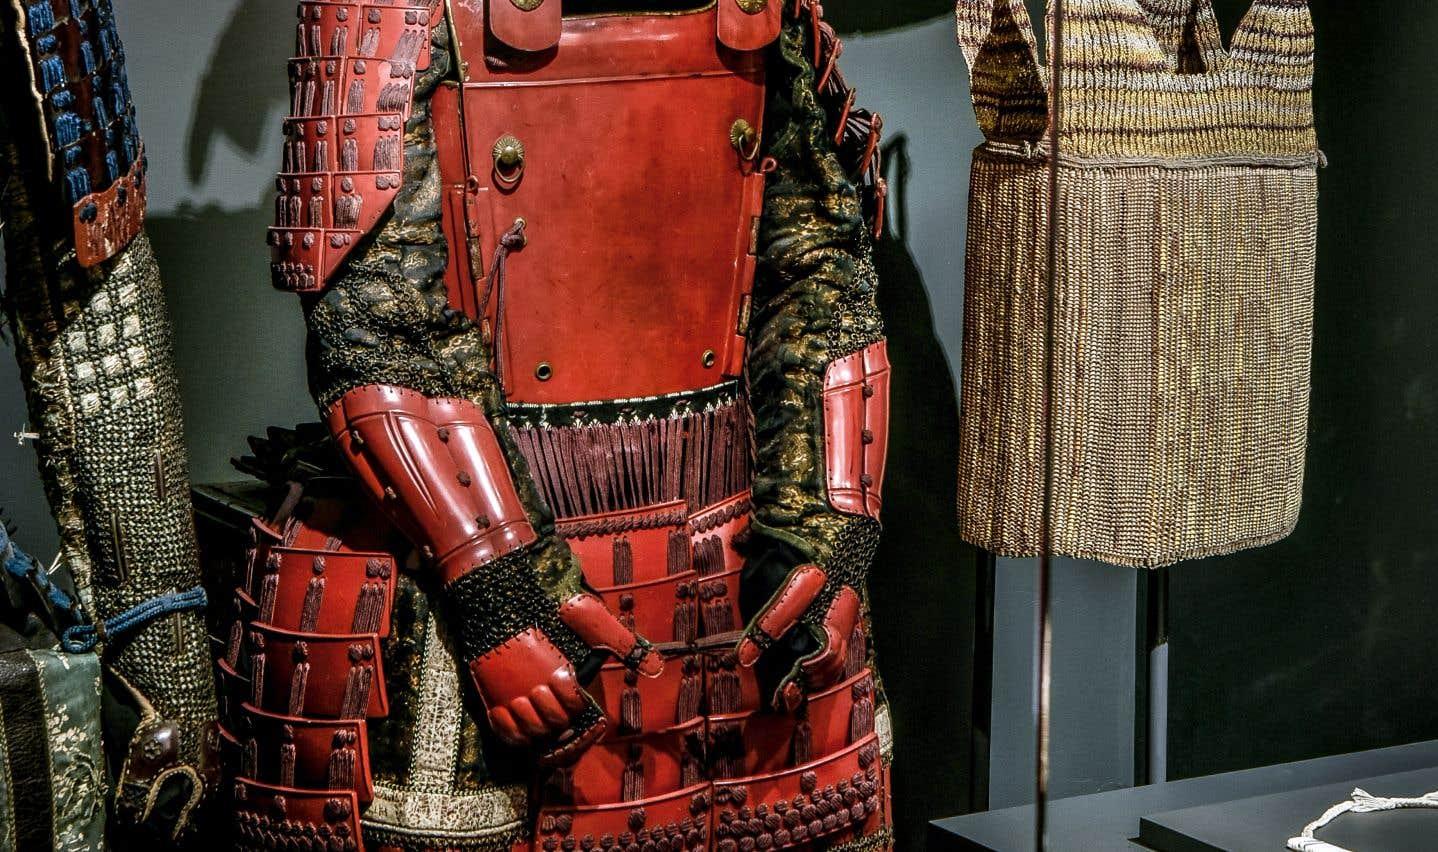 Armure de samouraï de type yukinoshita dou de la période Edo (Collection Richard Béliveau).